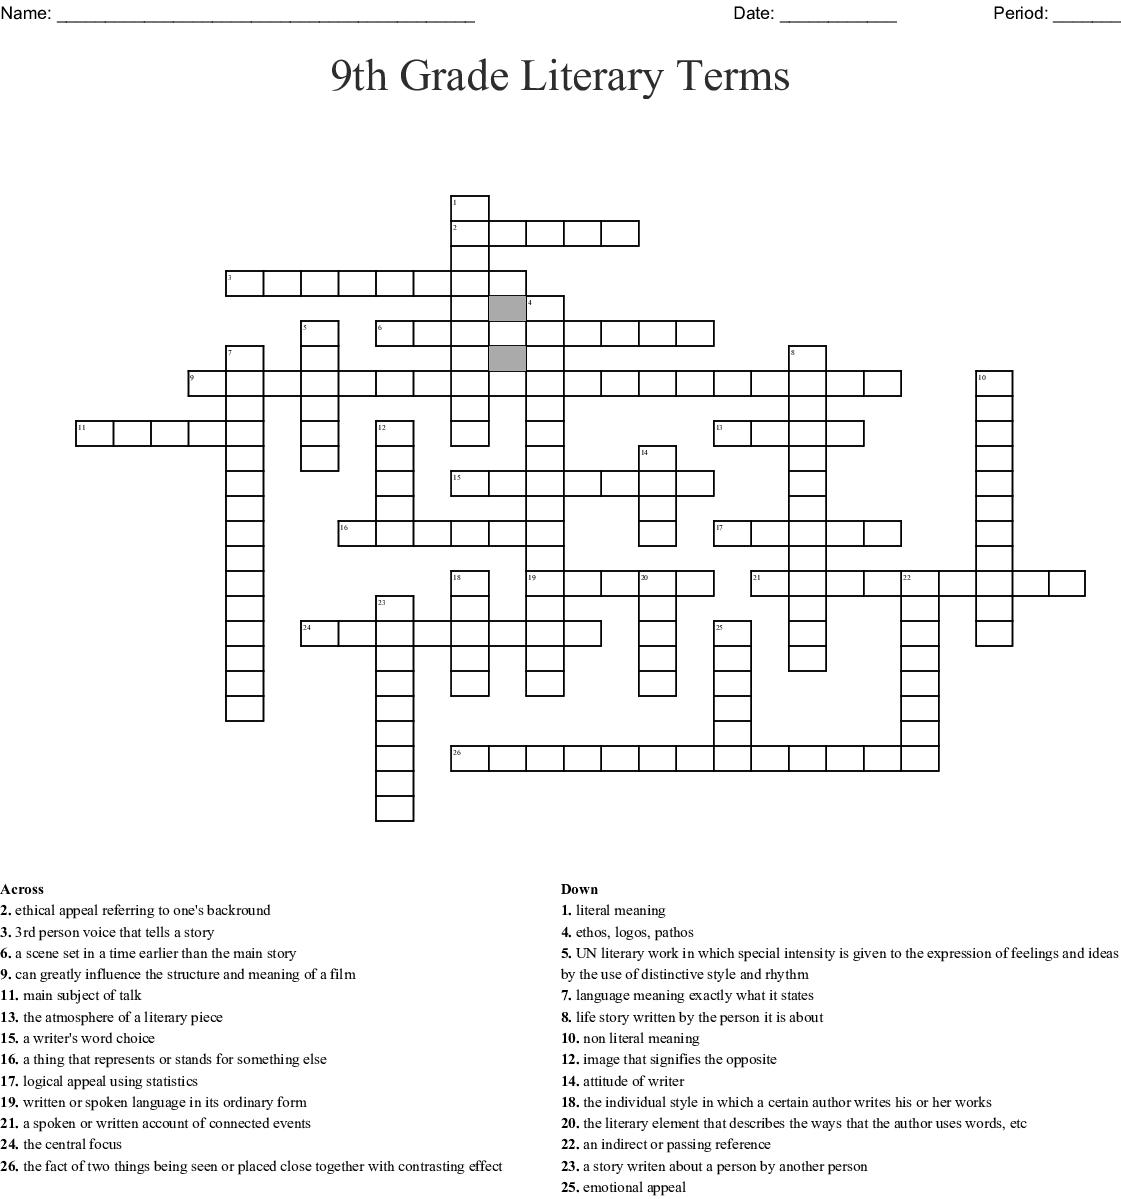 9th Grade Literary Terms Crossword - WordMint